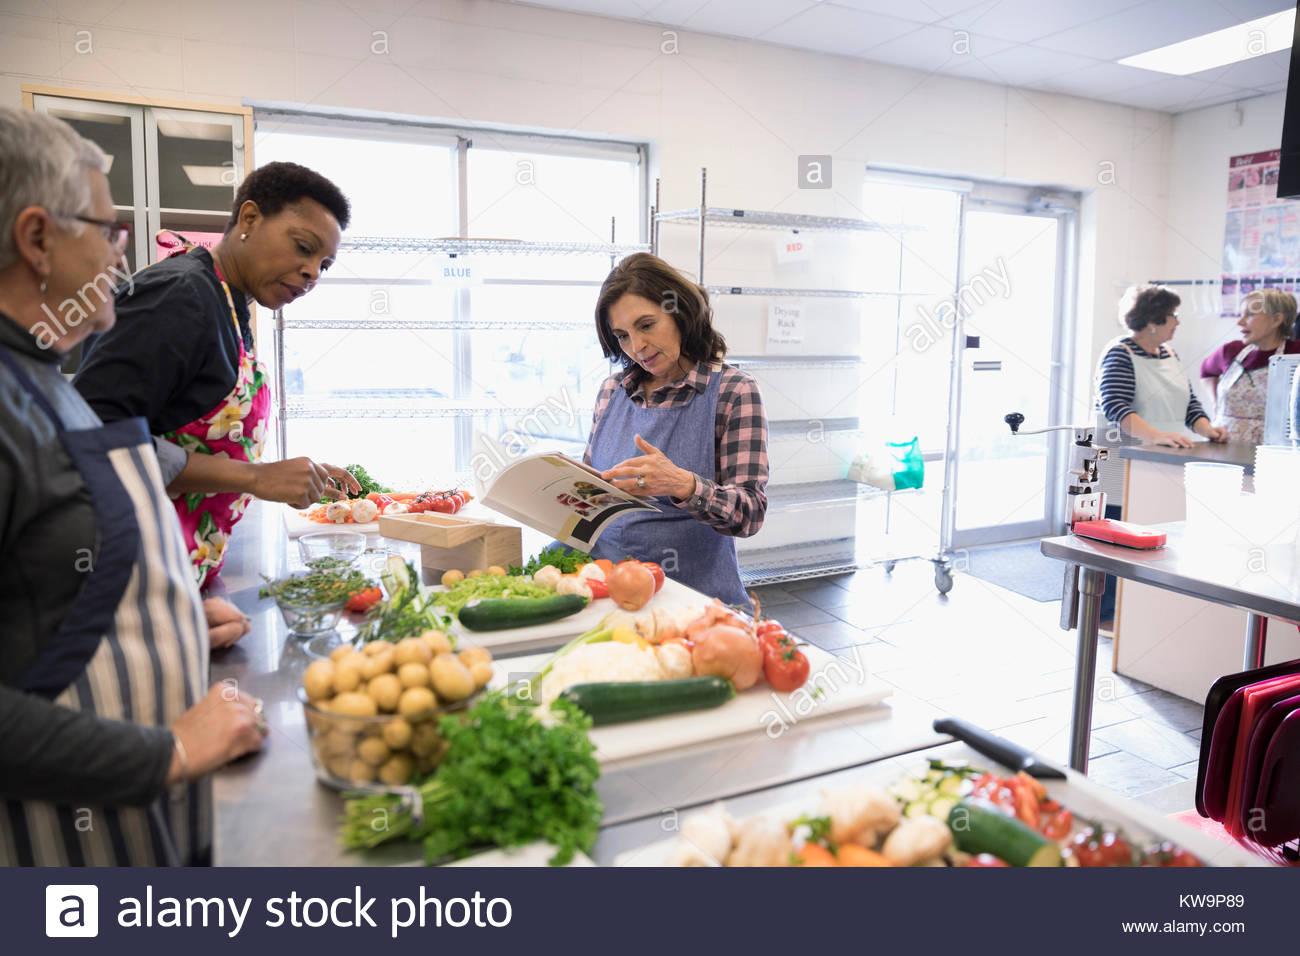 Volunteer Soup Kitchen Stock Photos & Volunteer Soup Kitchen Stock ...